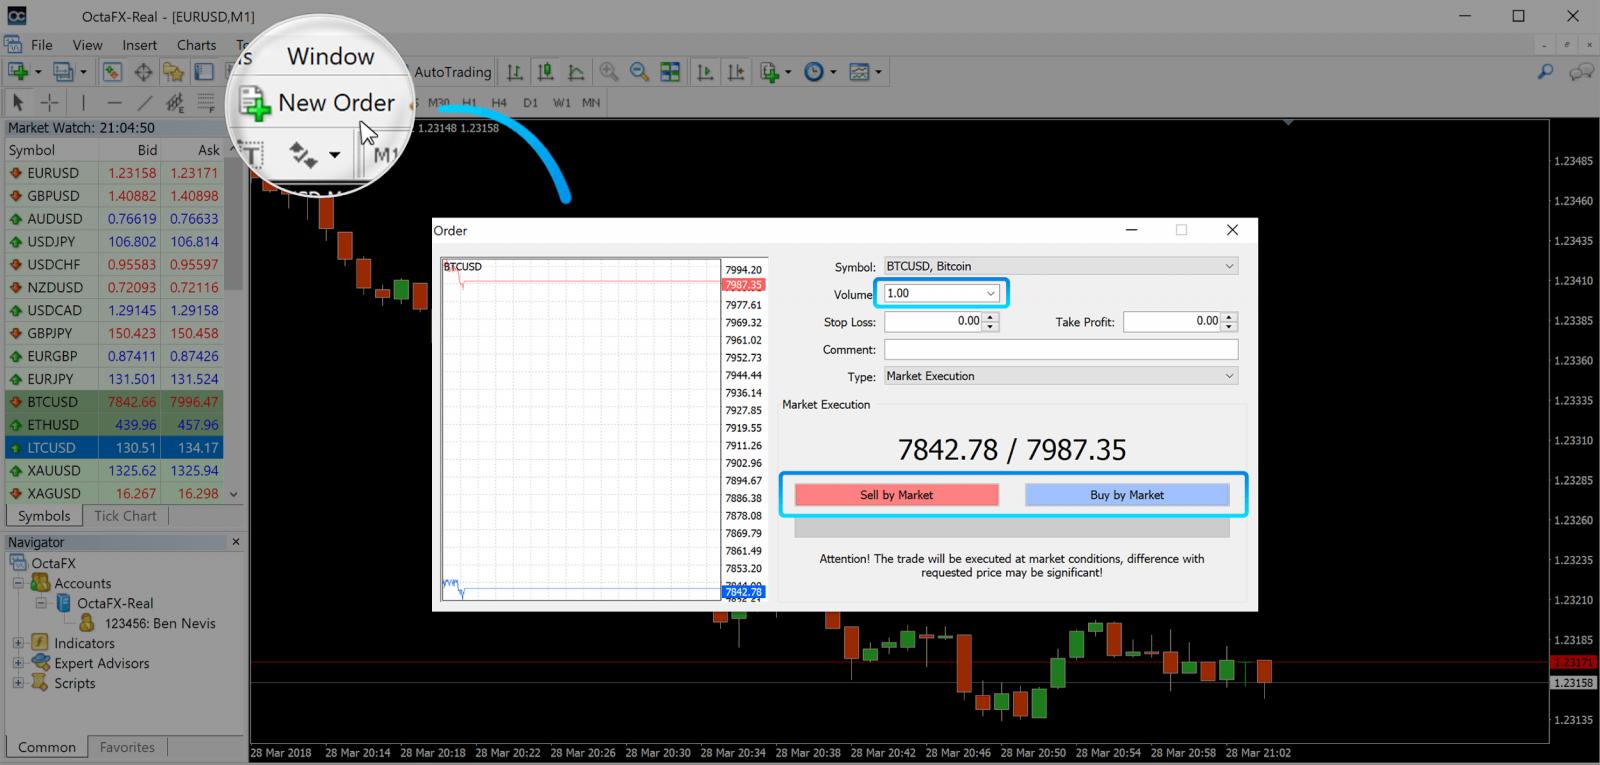 How to Start Forex Trading on OctaFX MT4/ MT5 Desktop